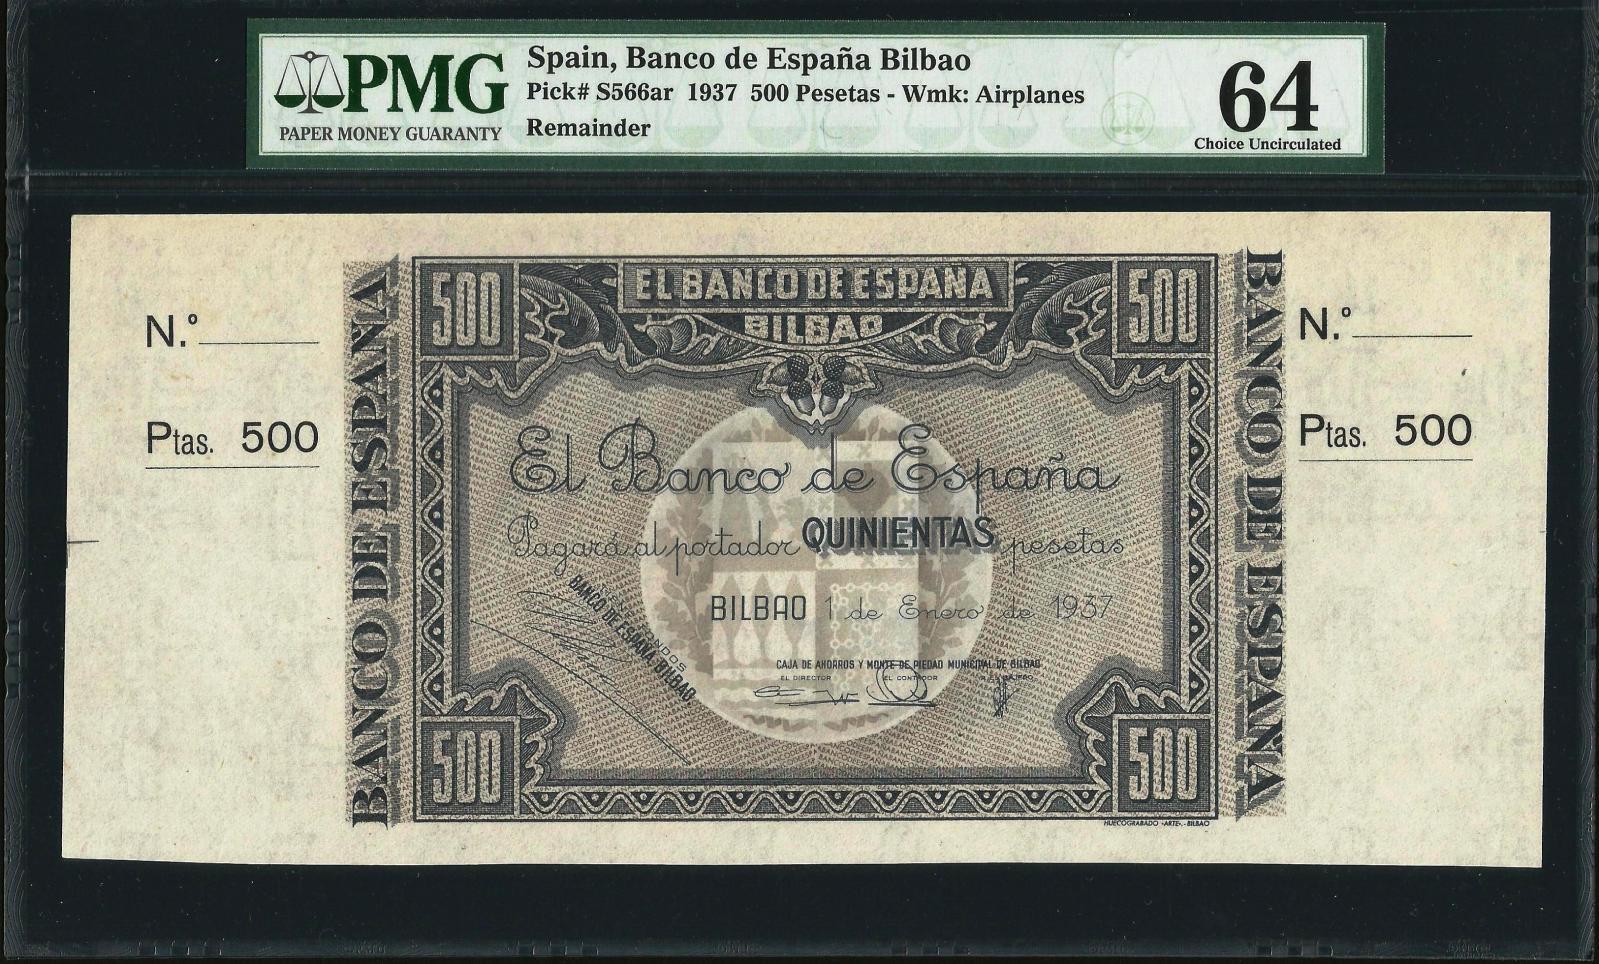 500 Pesetas Banco de España Bilbao, 1937 Ajxkki